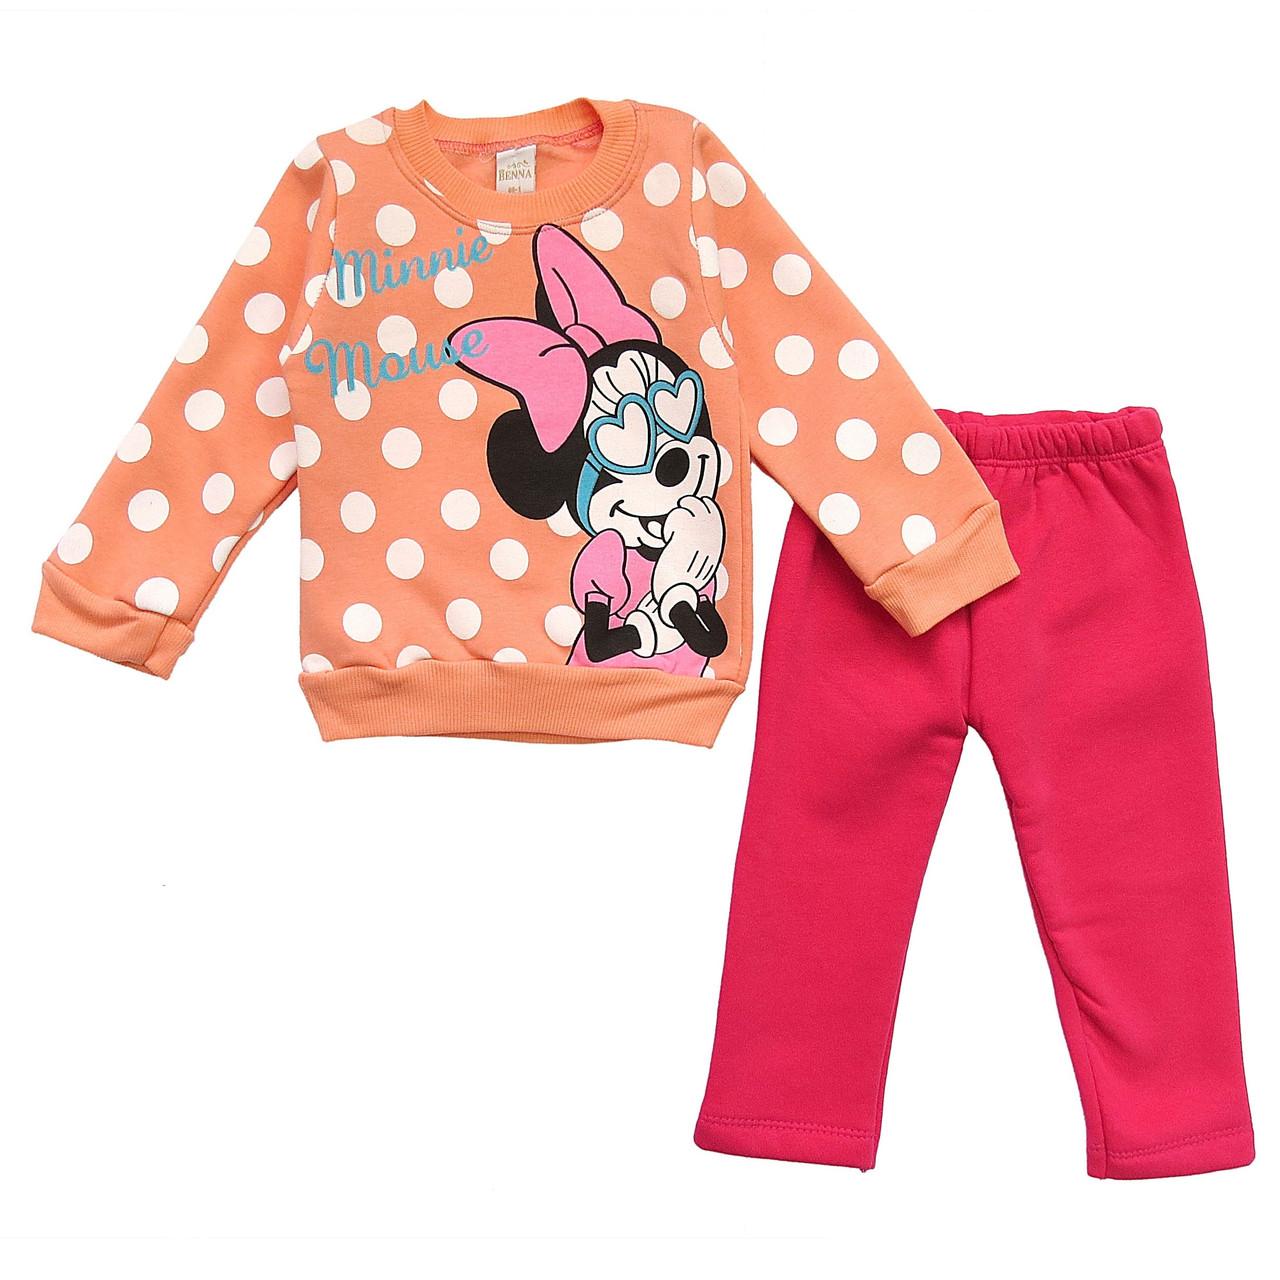 Теплый костюм Minnie Mouse для девочки.